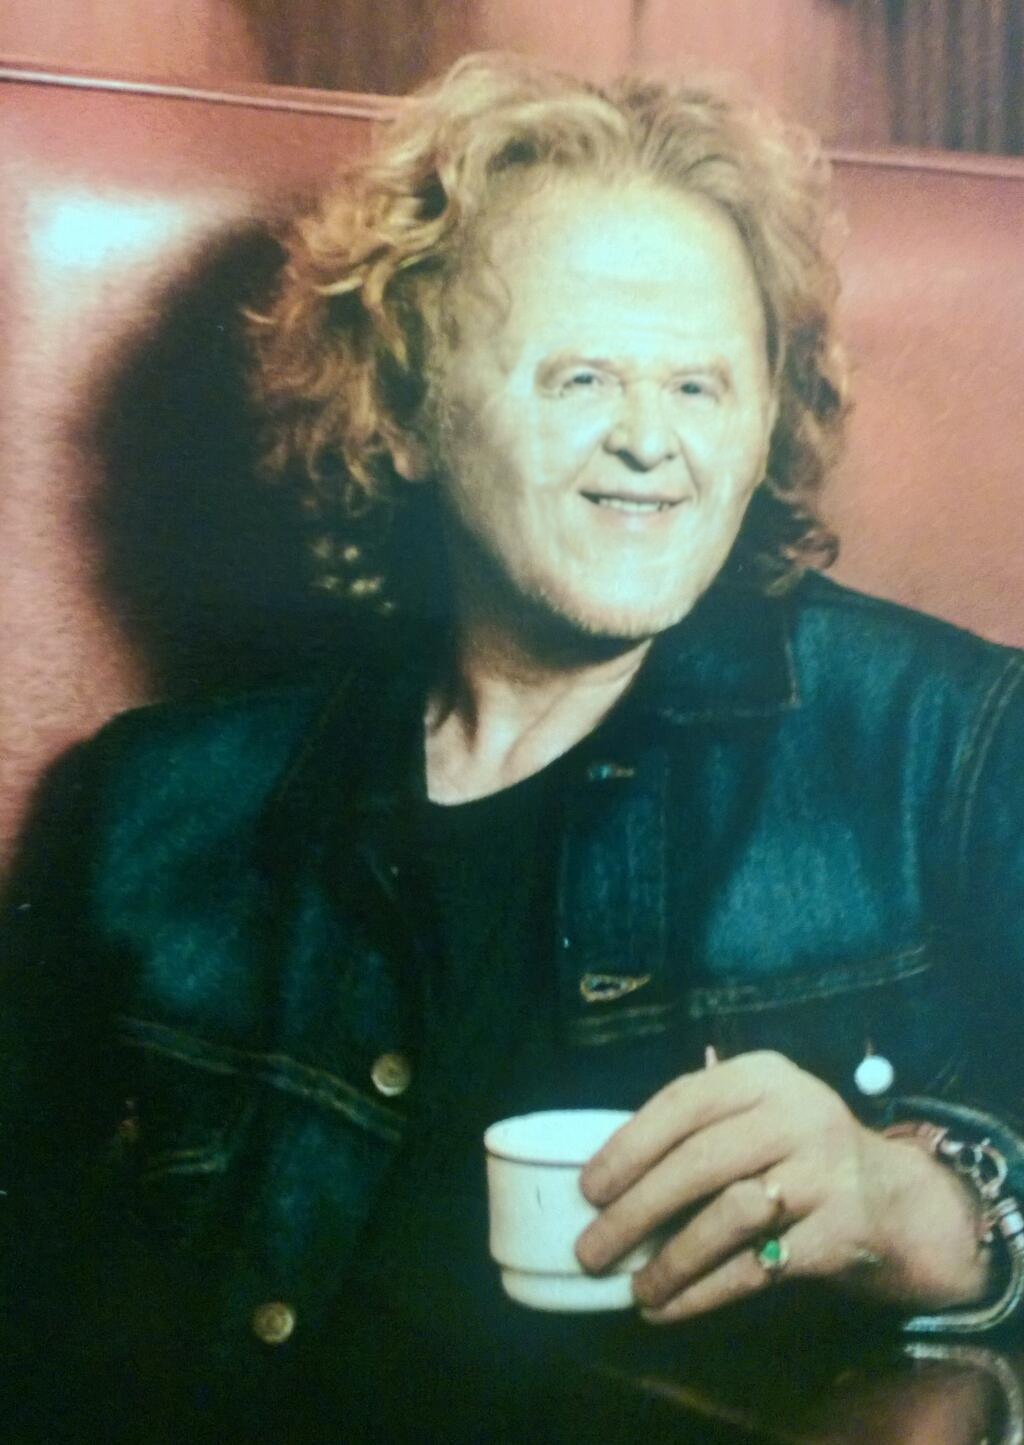 Small Faced Celebrities Mick Hucknall The Poke